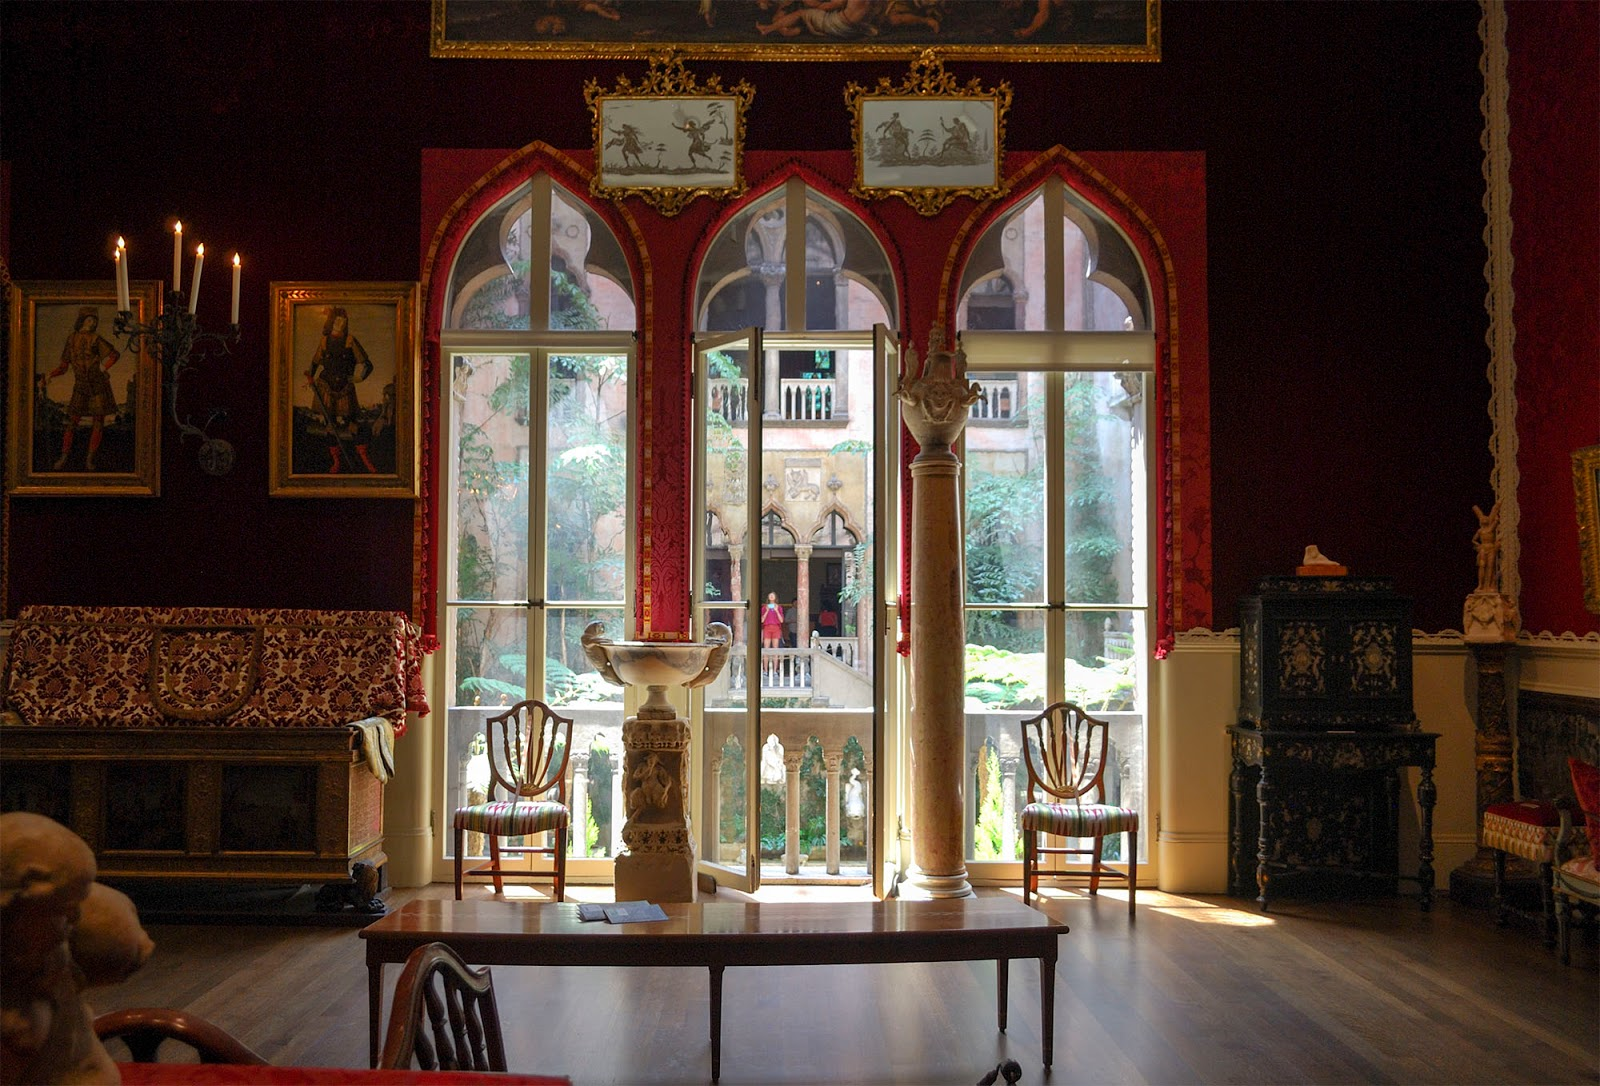 isabella stewart gardner museum venetian palace boston itinerary plan guide tourism usa america park east coast